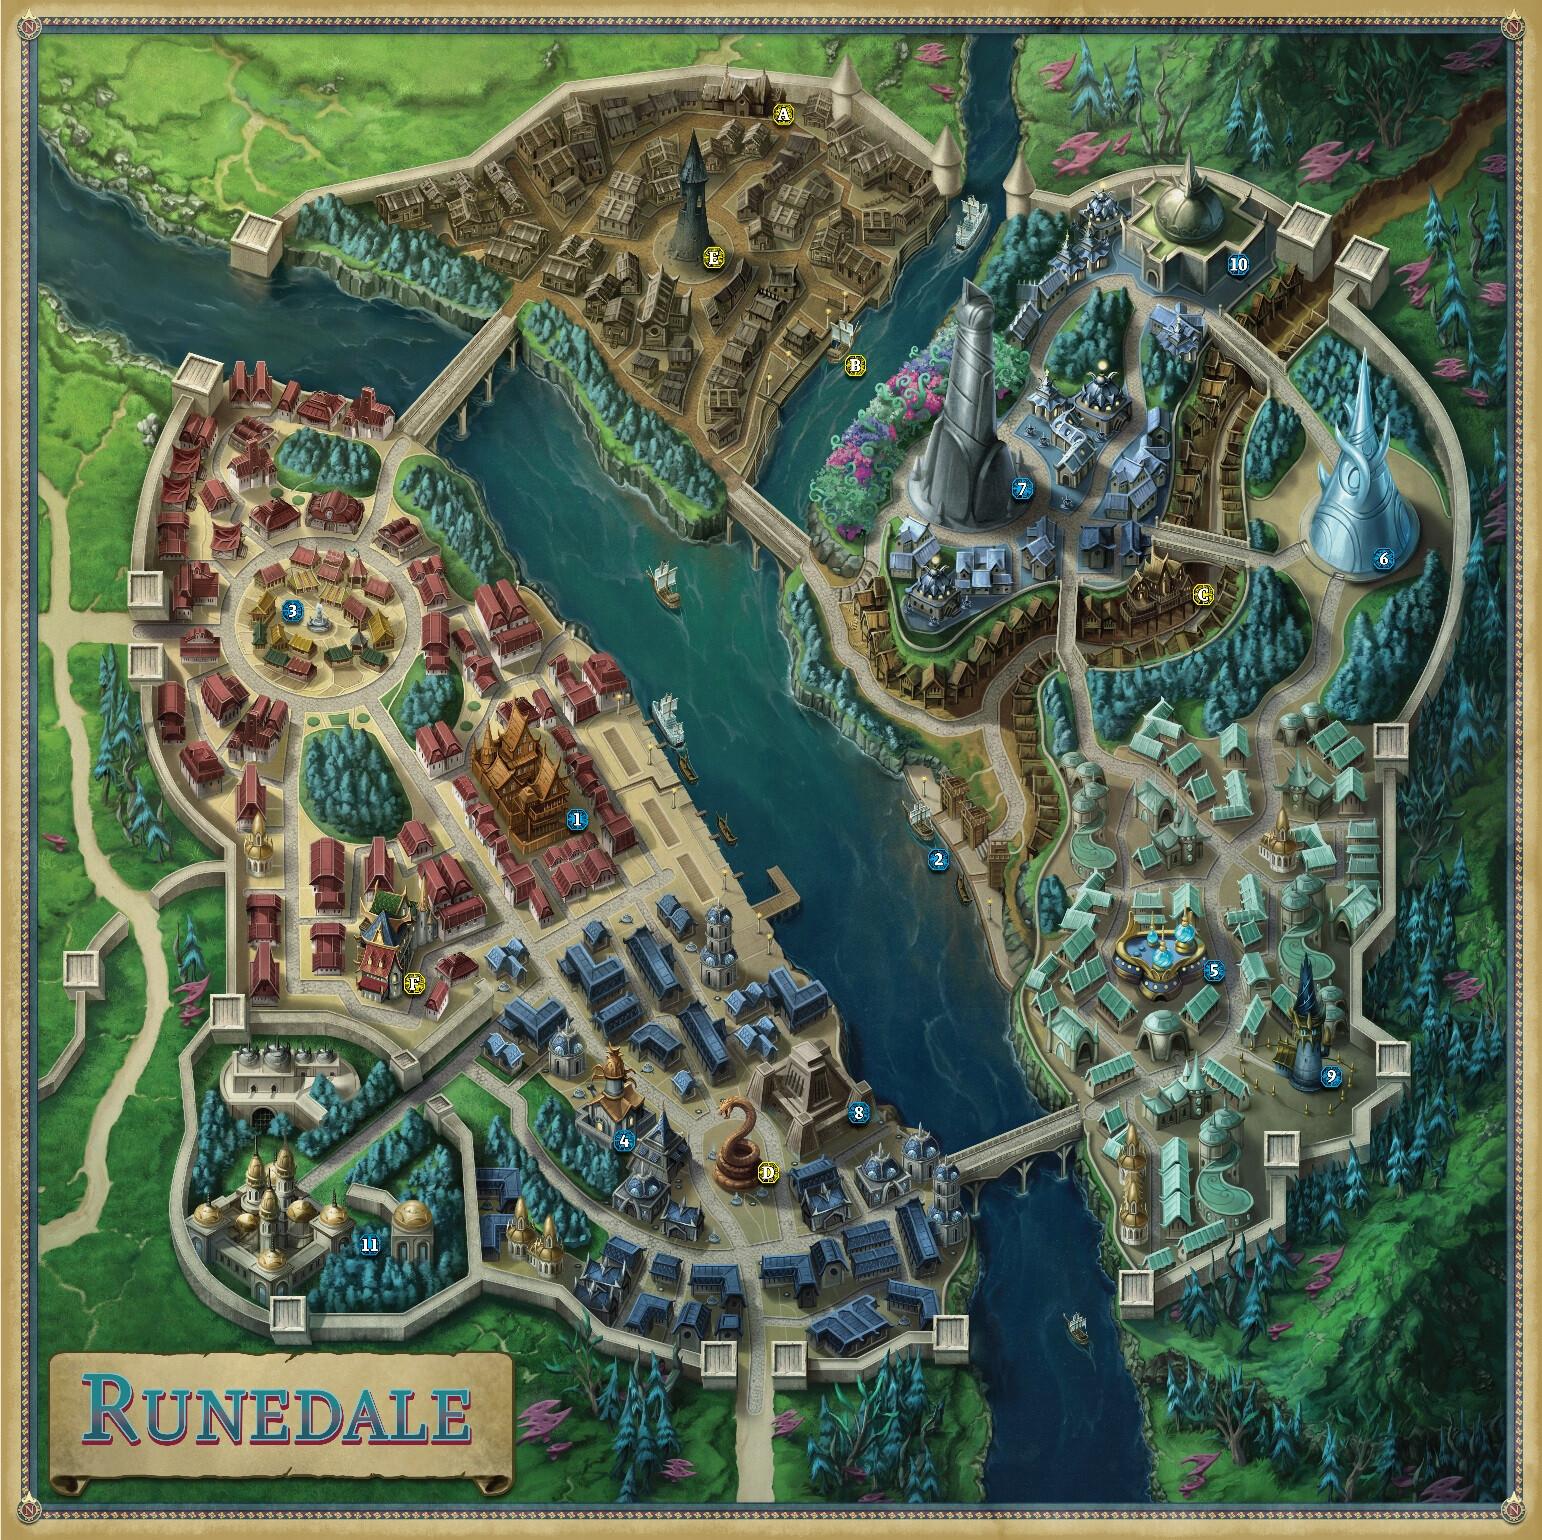 City map of Runedale